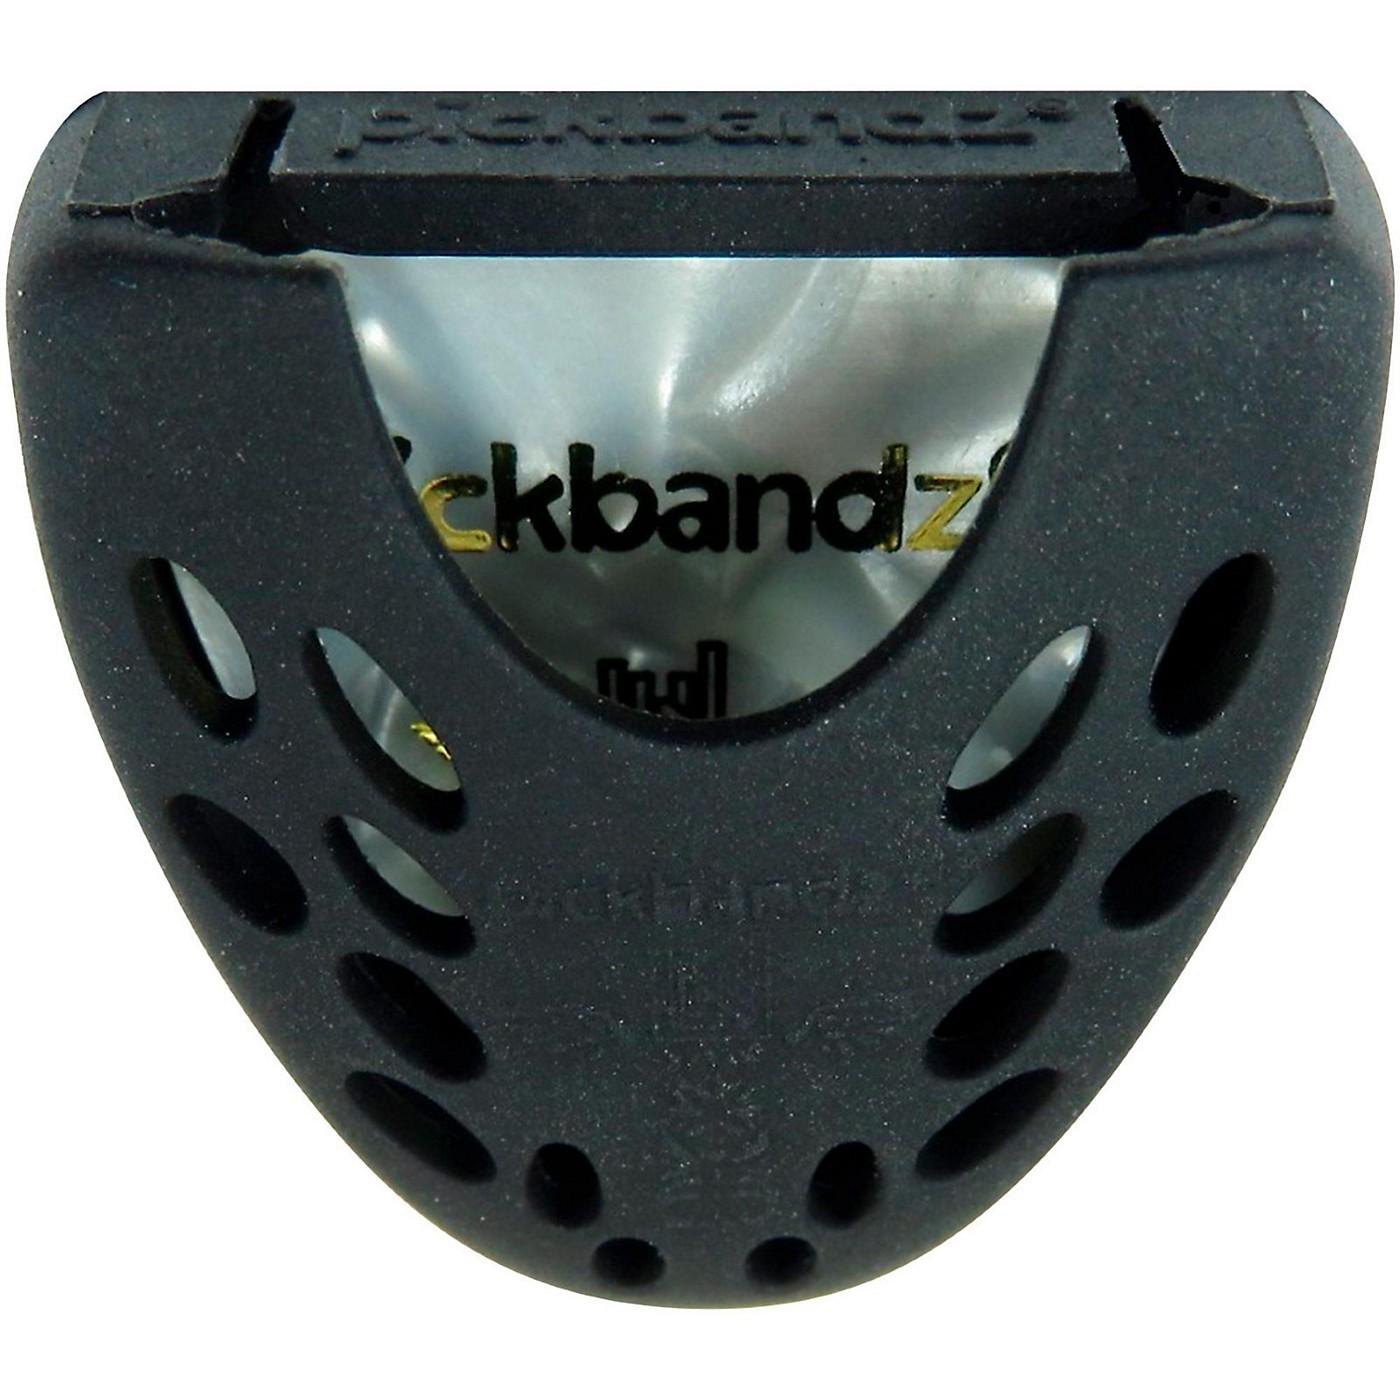 Pickbandz Stick-it-Pick-it Pick Holder thumbnail